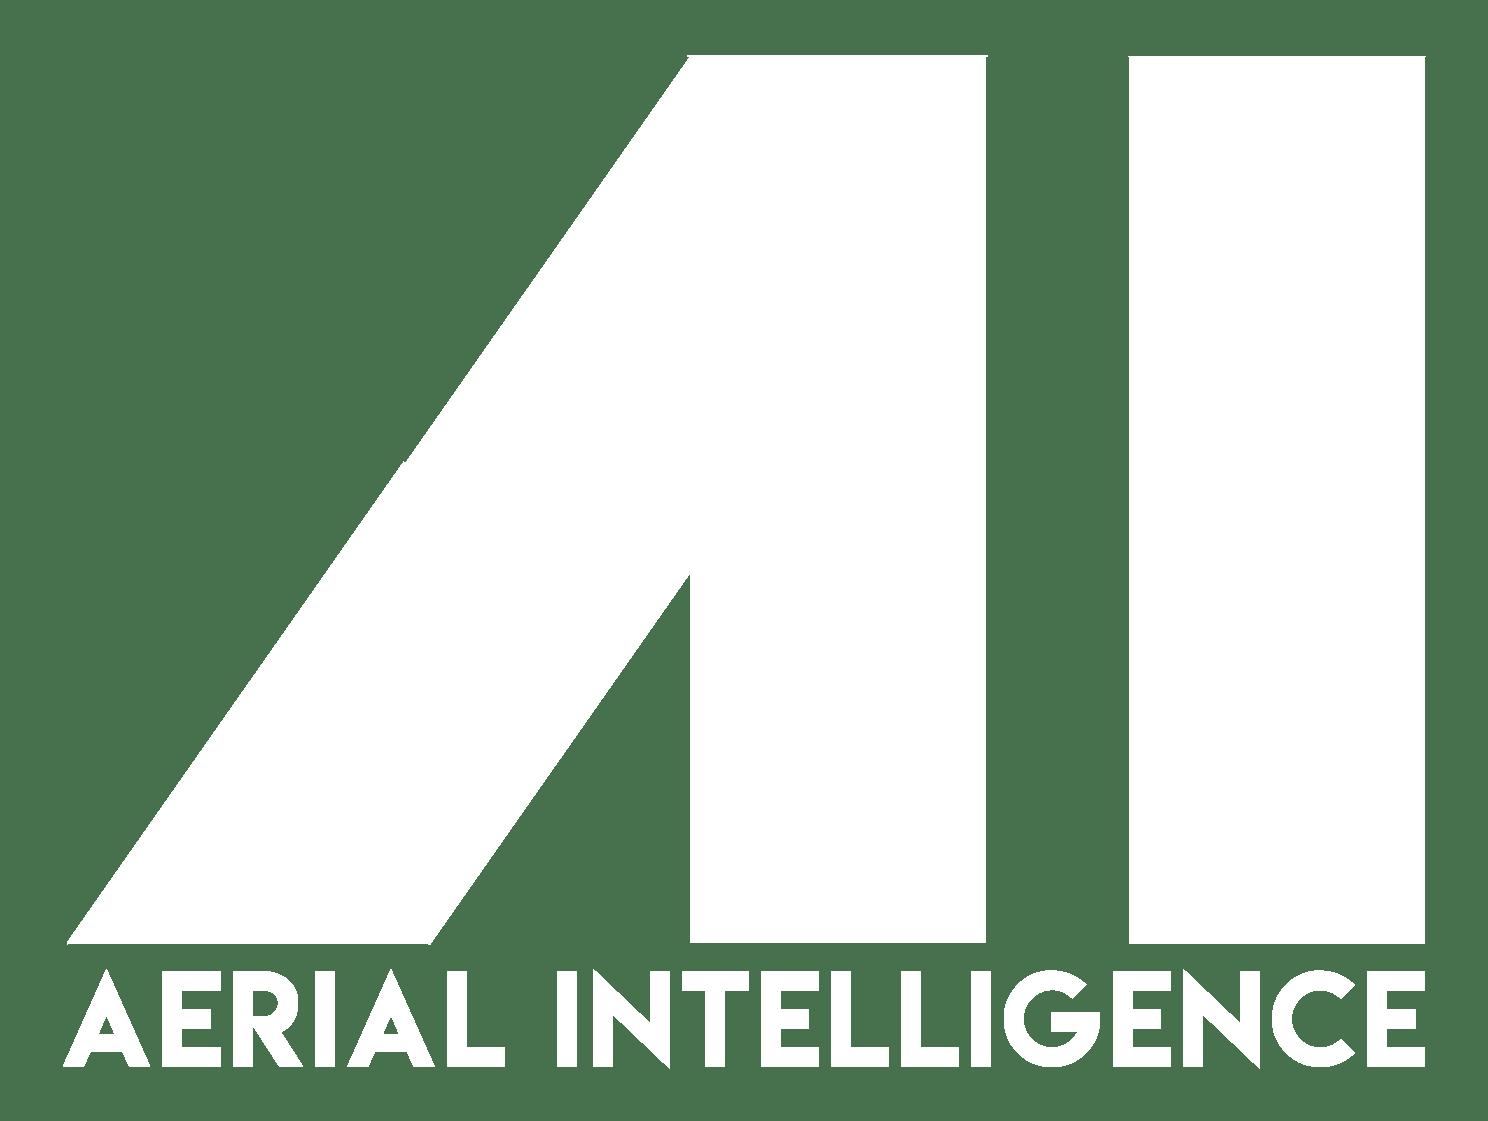 Aerial Intelligence